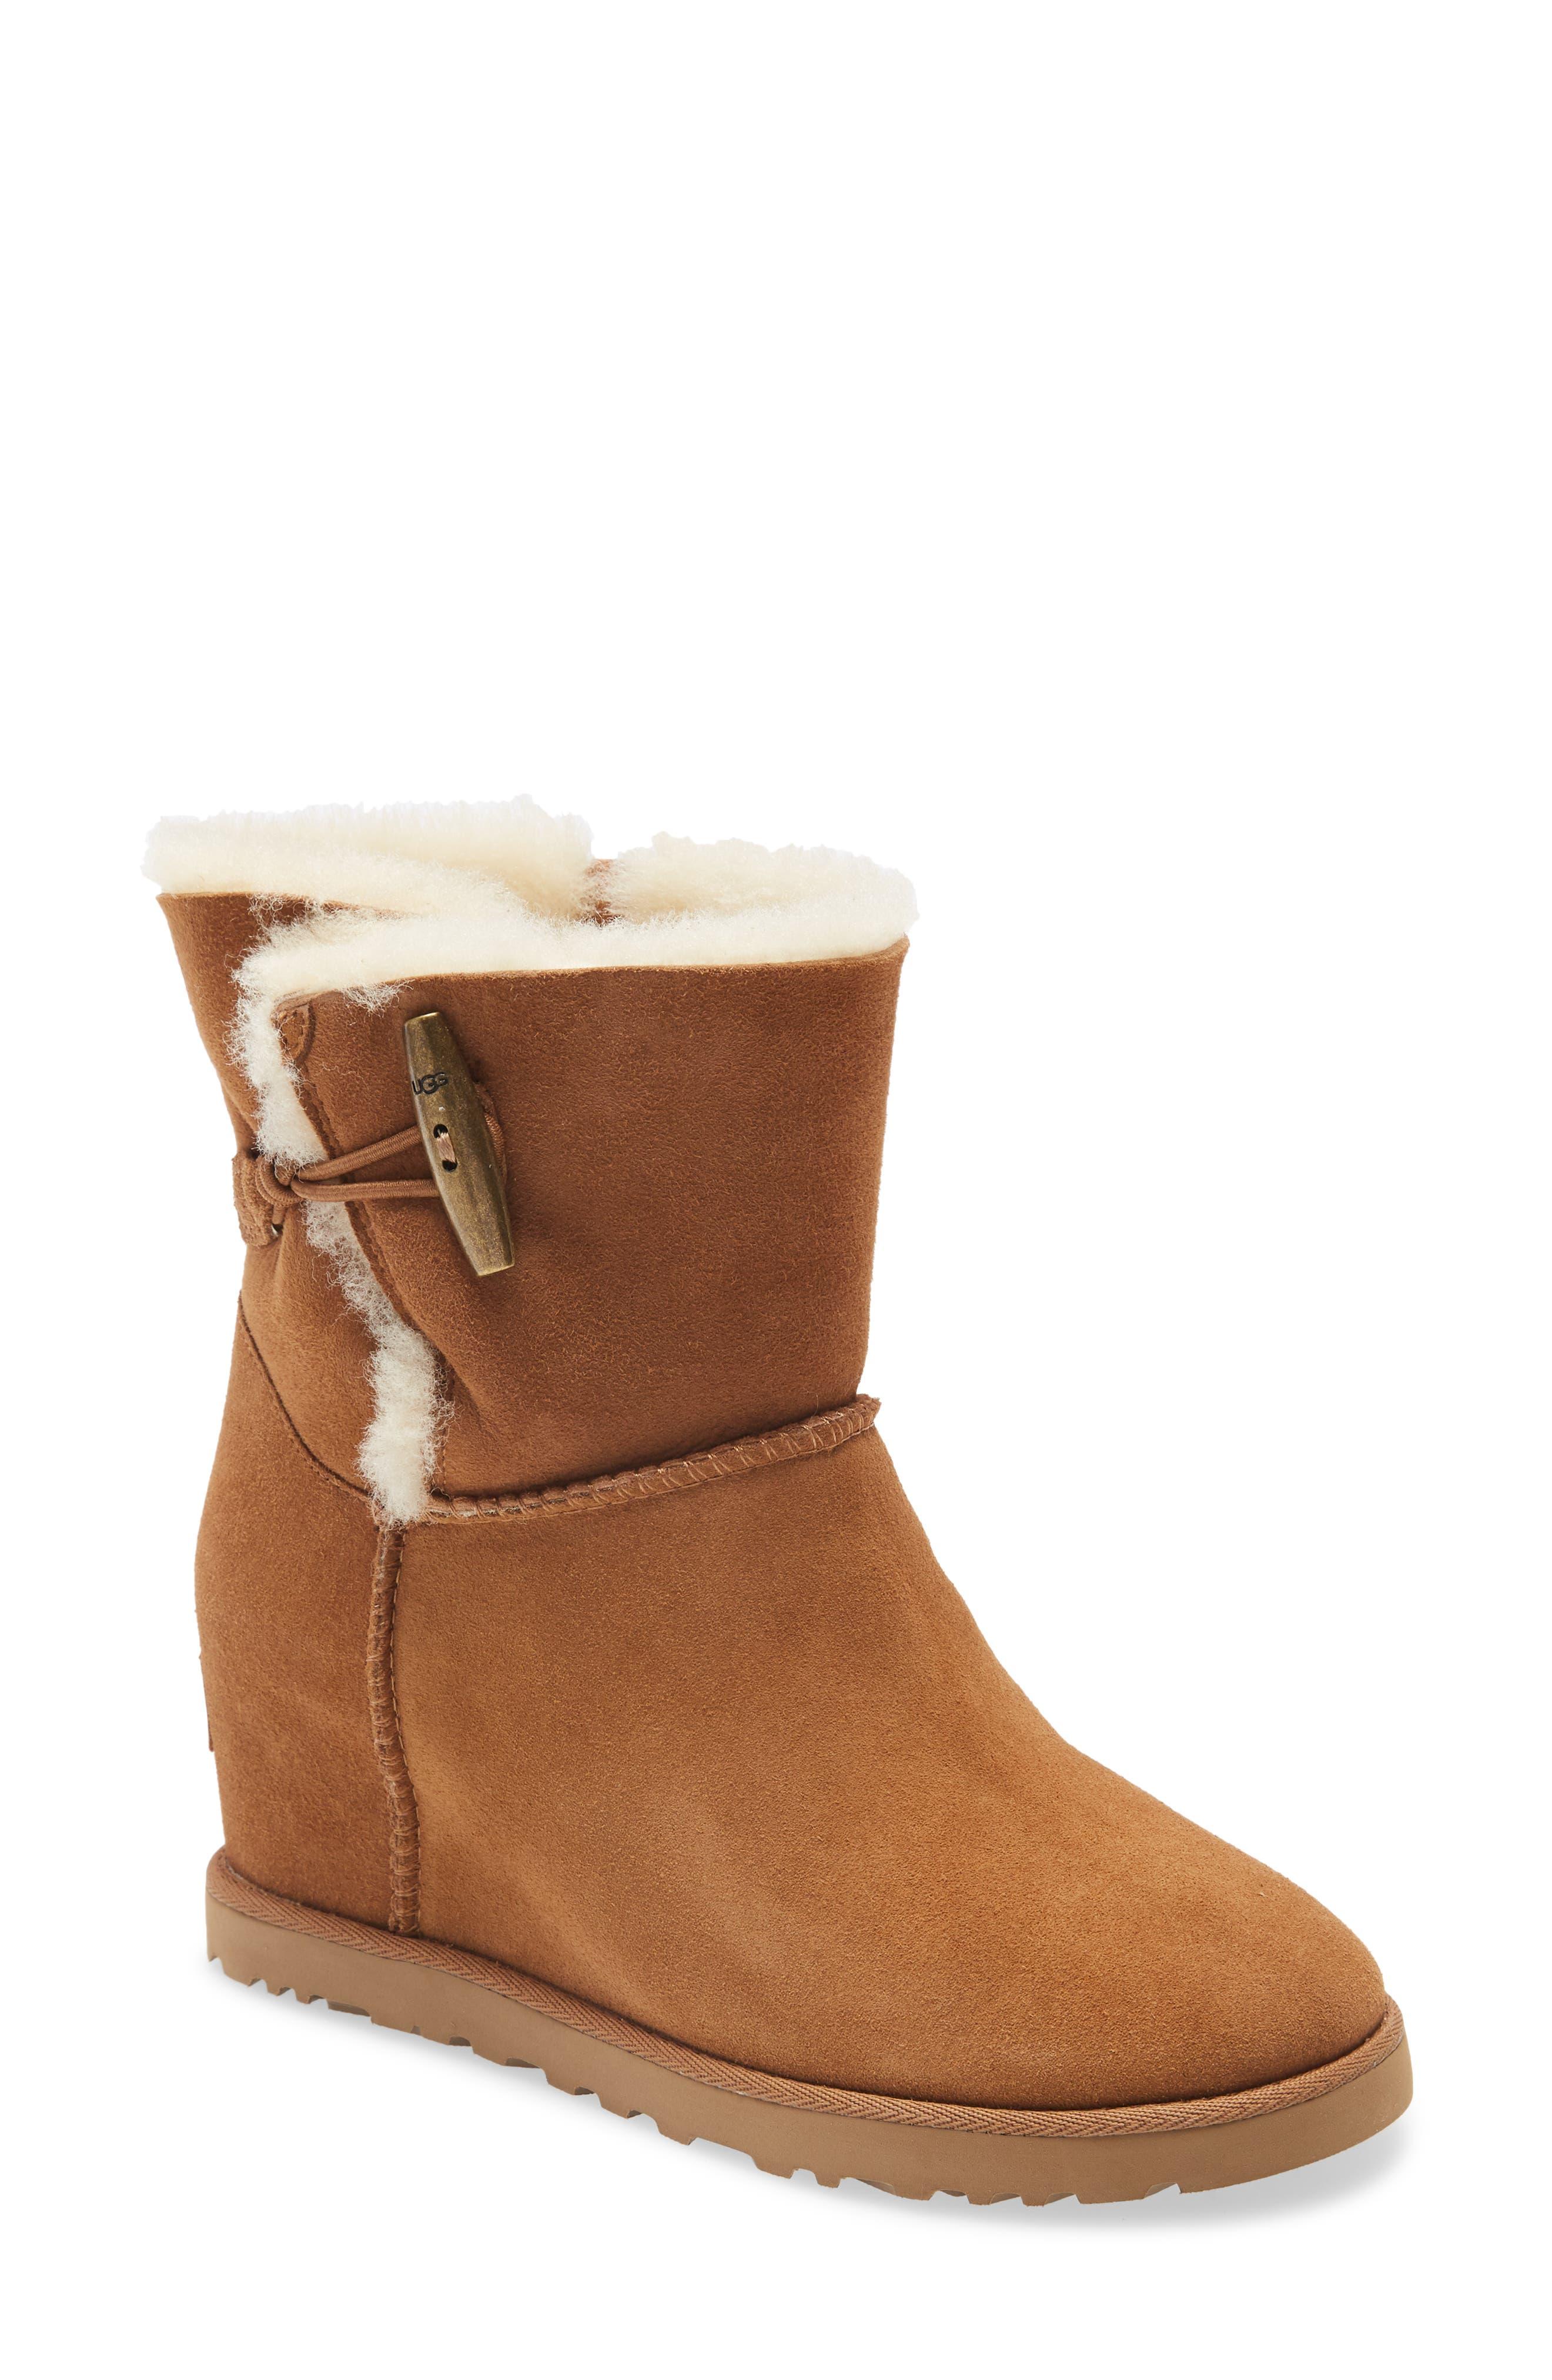 Women's UGG® Boots | Nordstrom